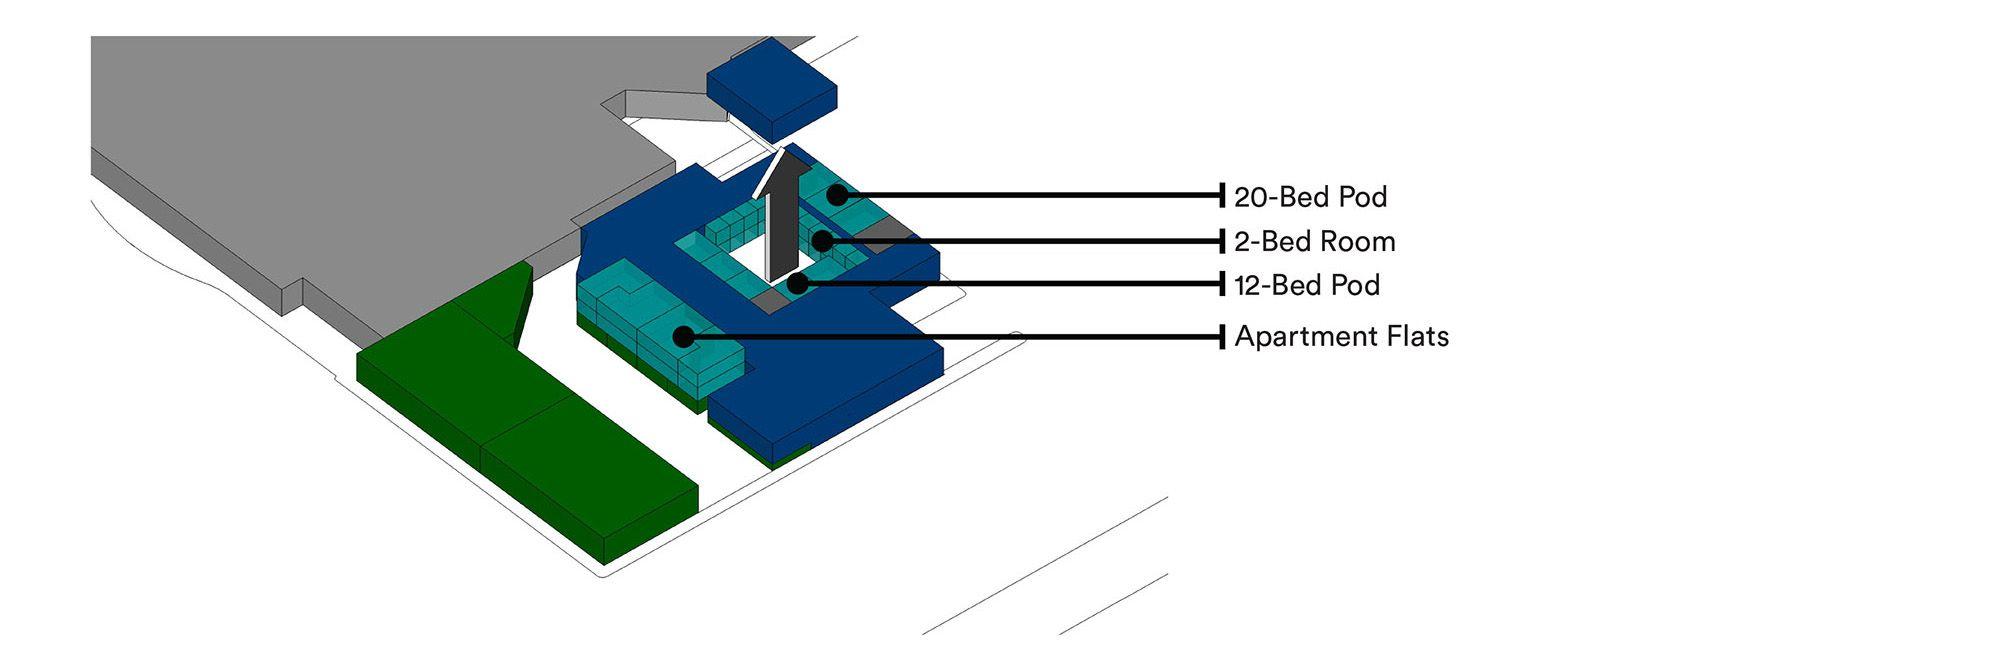 ReHabit Architecture plan